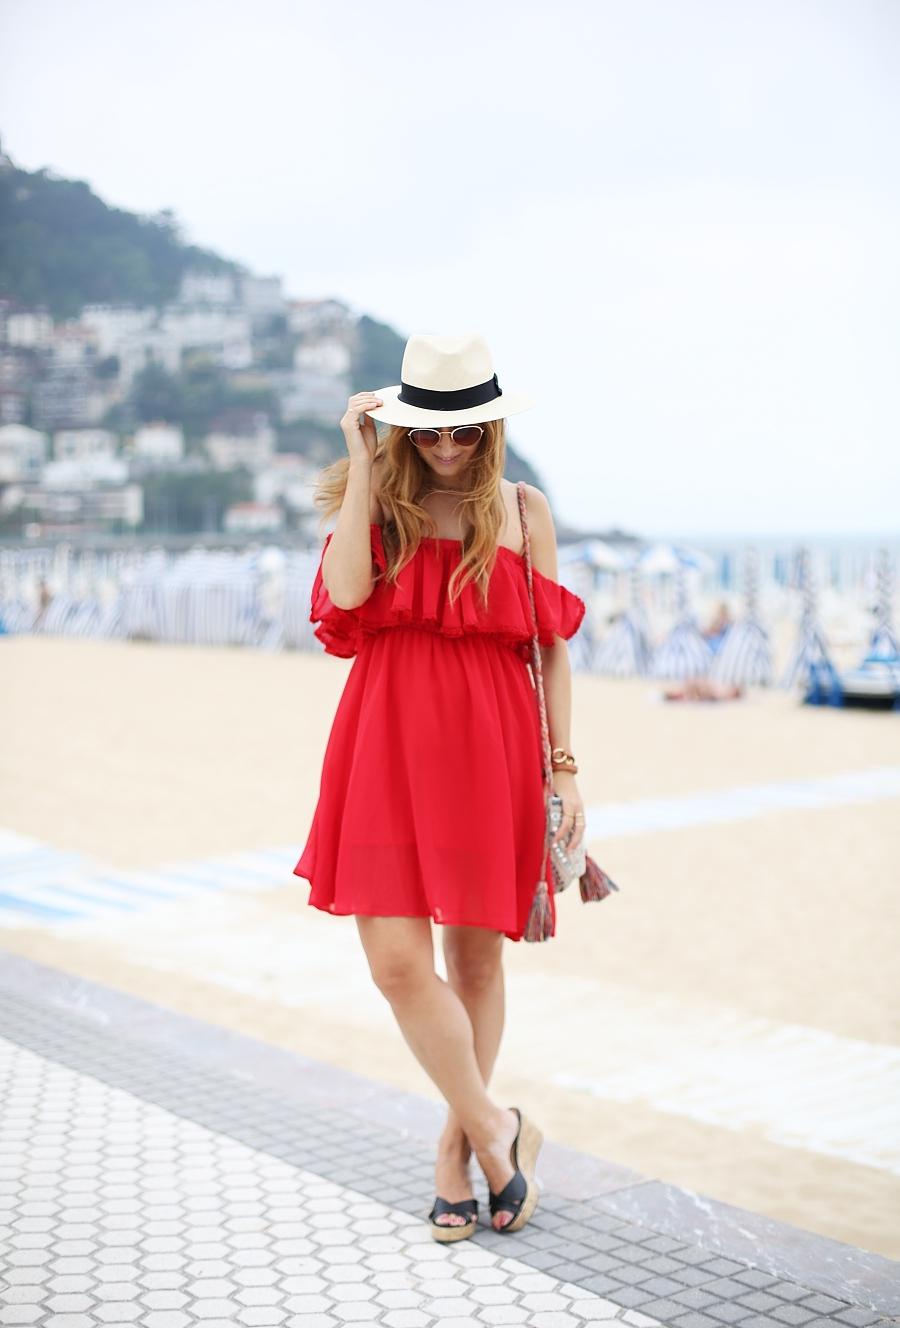 Vestido rojo de verano